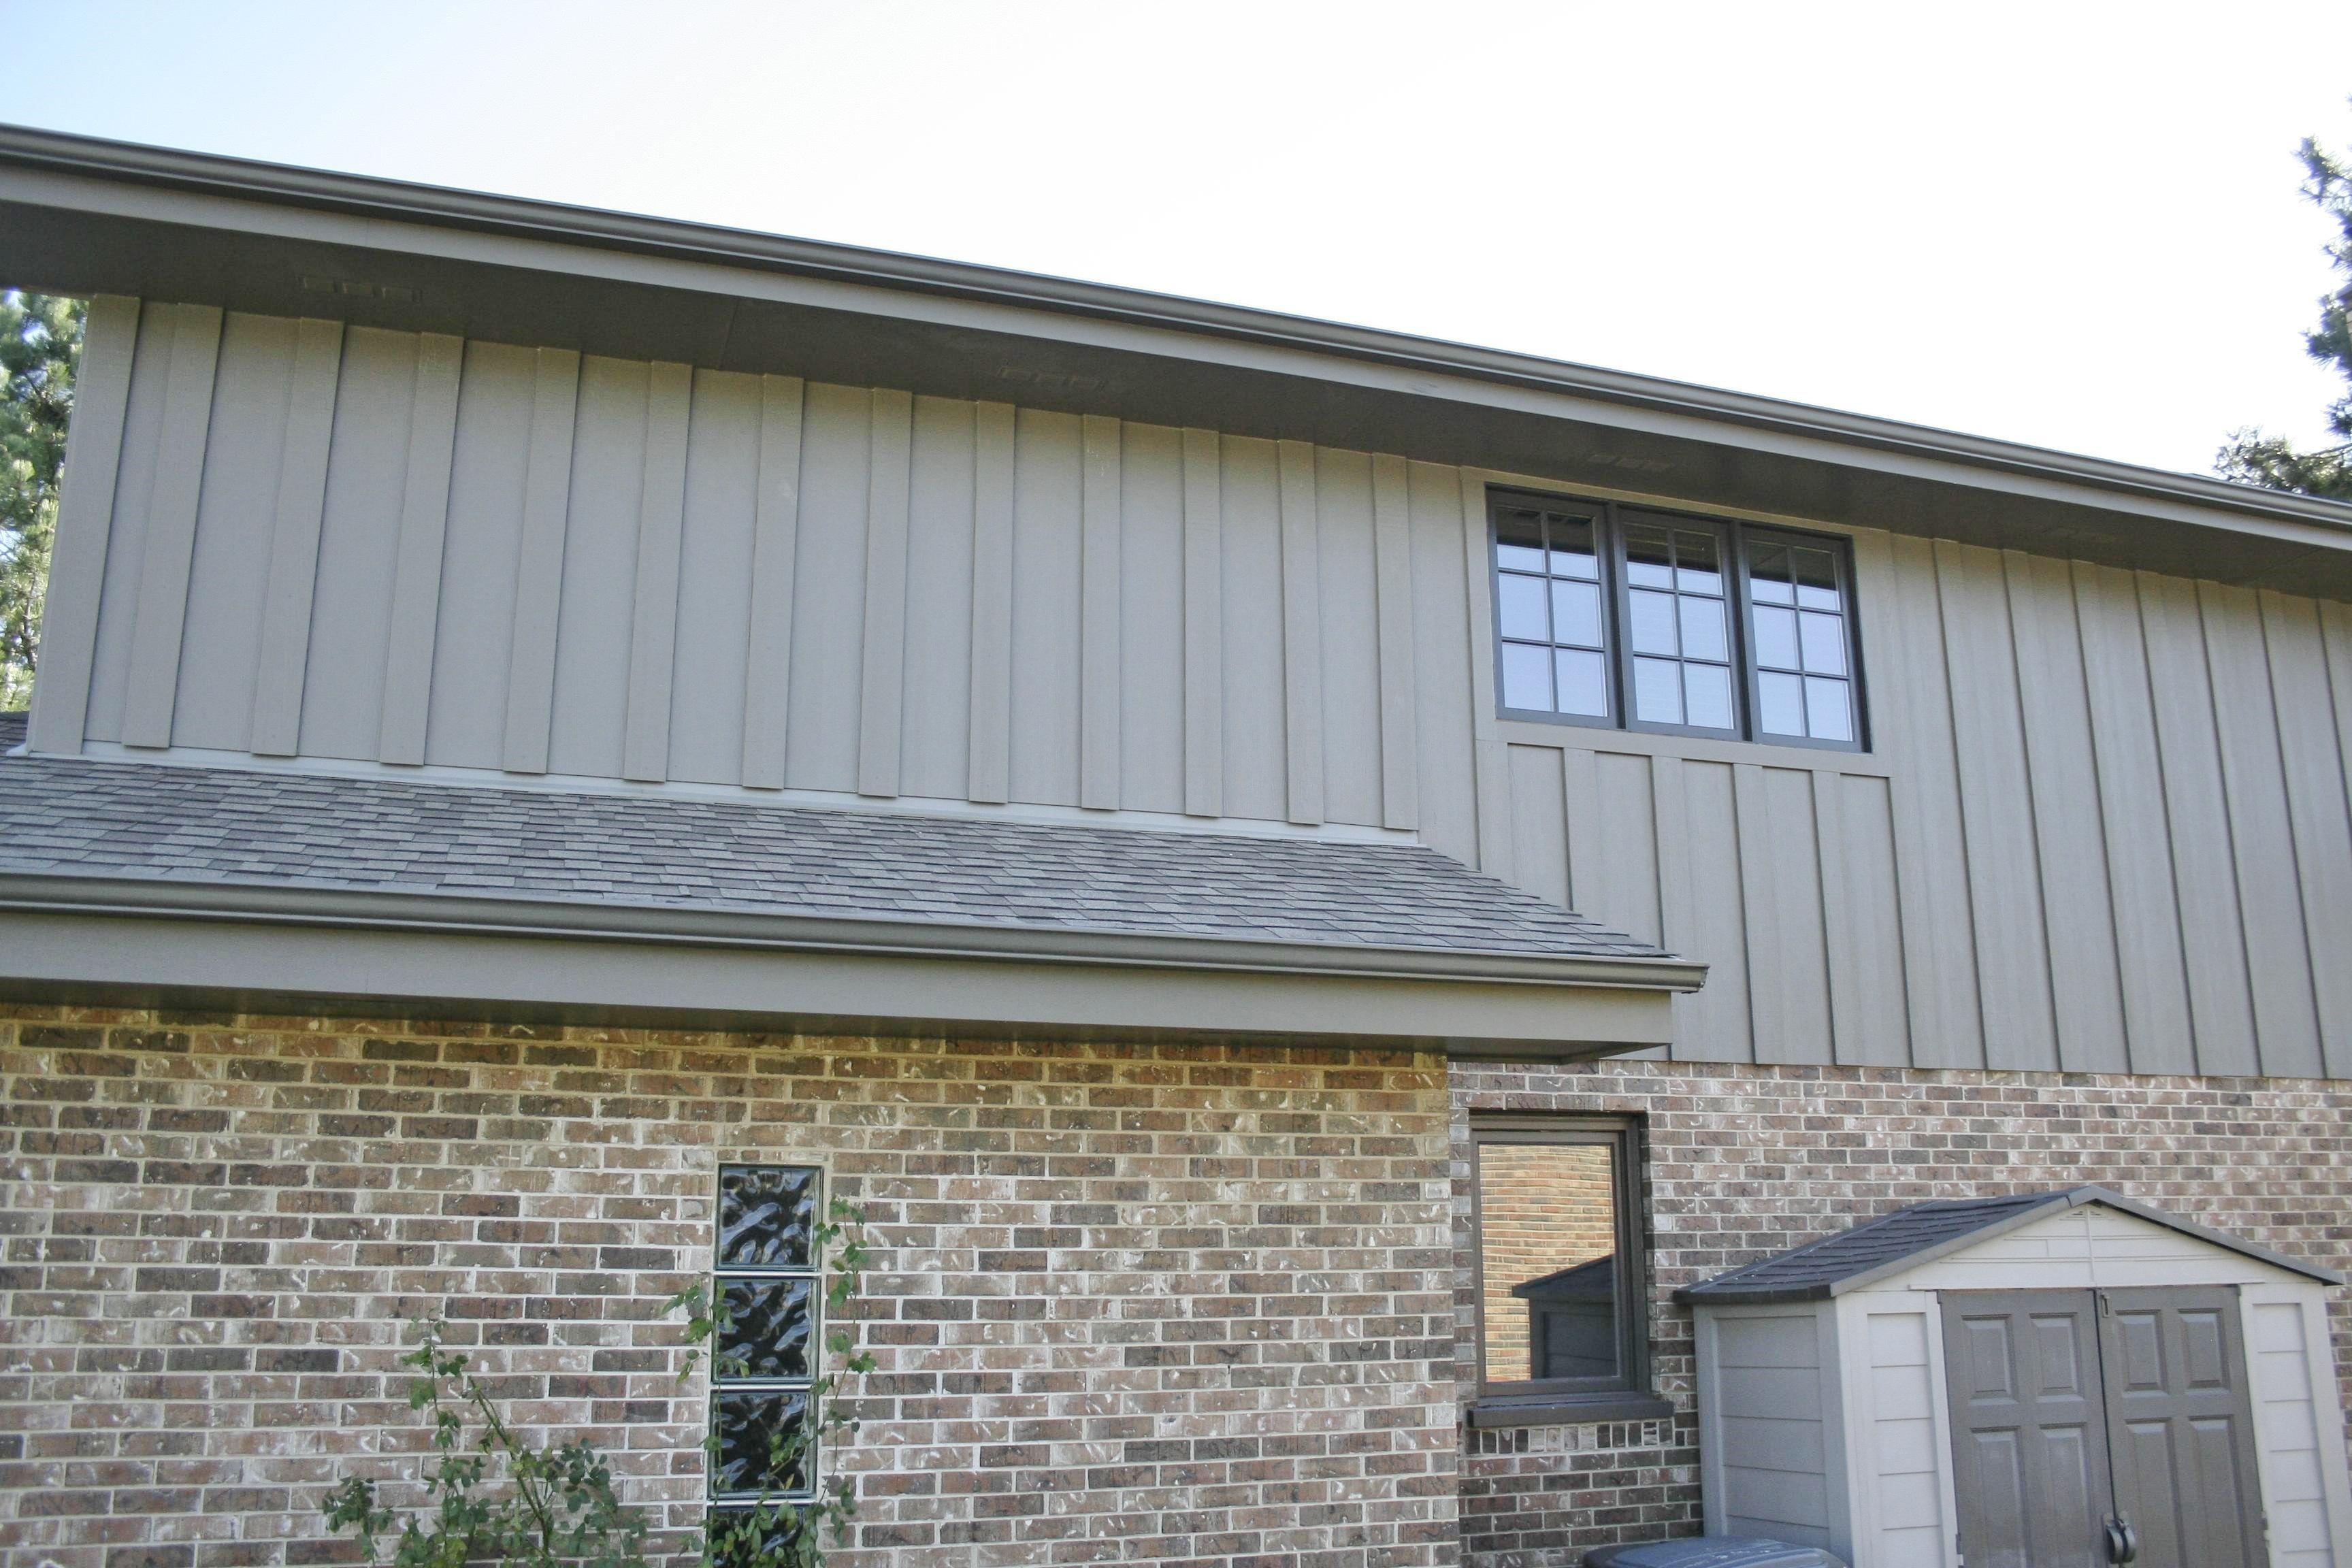 James Hardie Hardiepanel Vertical Siding Timberbark 13722 Santa Fe Trail Orland Park Il 2 Jpg 3 456 2 304 Pixels Vertical Siding House Exterior Exterior Brick